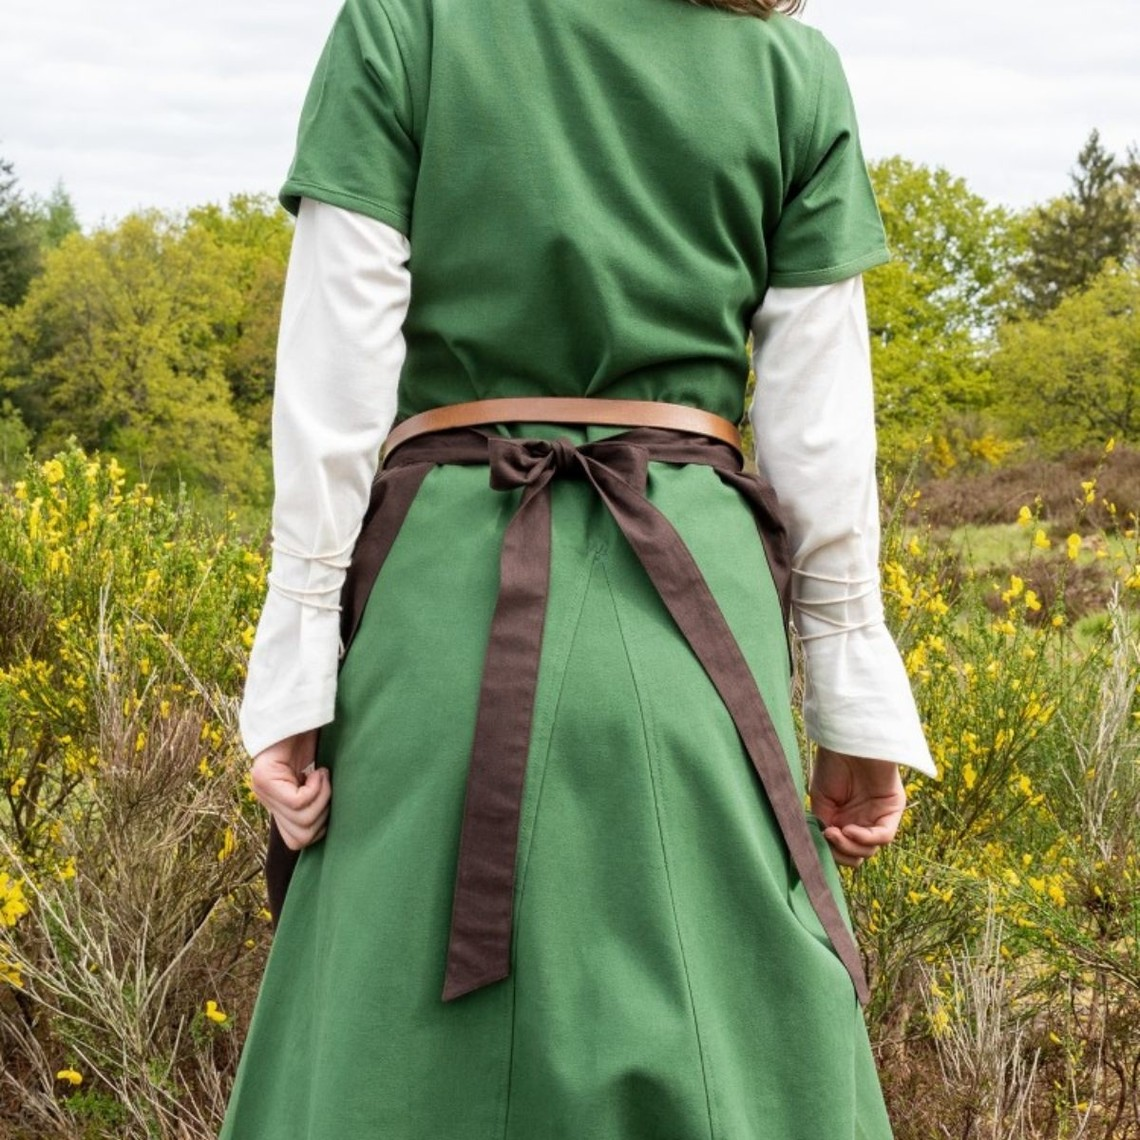 Cotehardie Odilia, groen